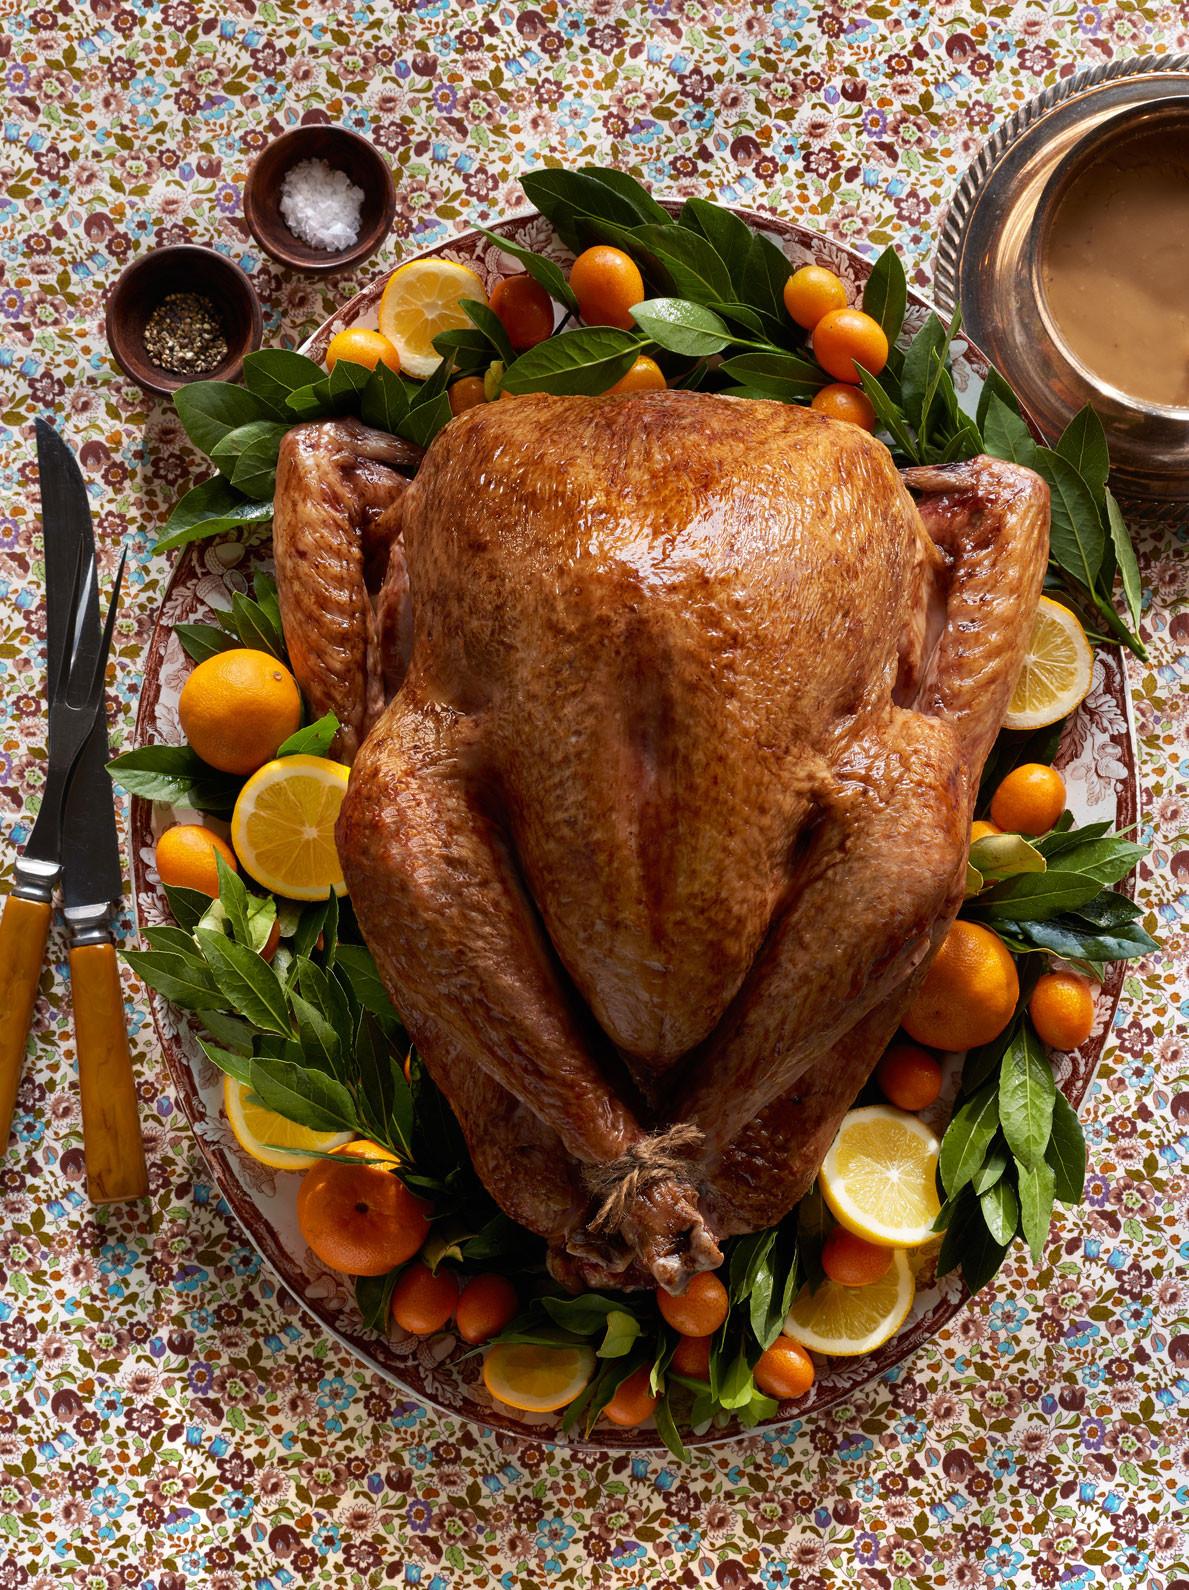 Turkey Pics Thanksgiving  25 Best Thanksgiving Turkey Recipes How To Cook Turkey